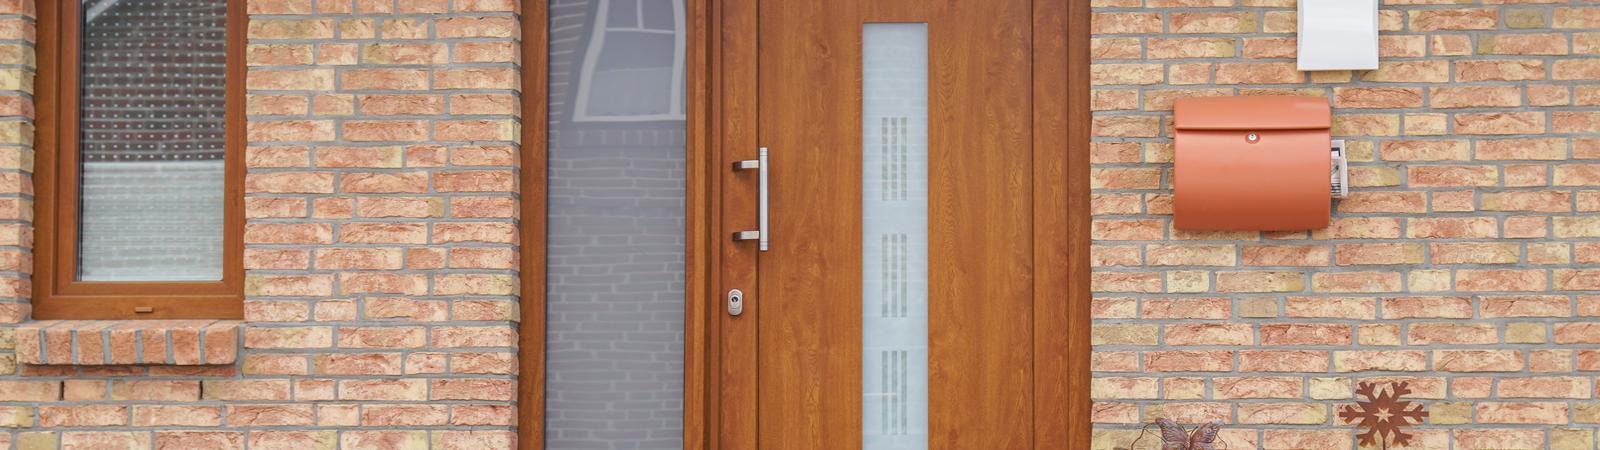 Haustür Preise: Kunststoff, Holz oder Aluminium